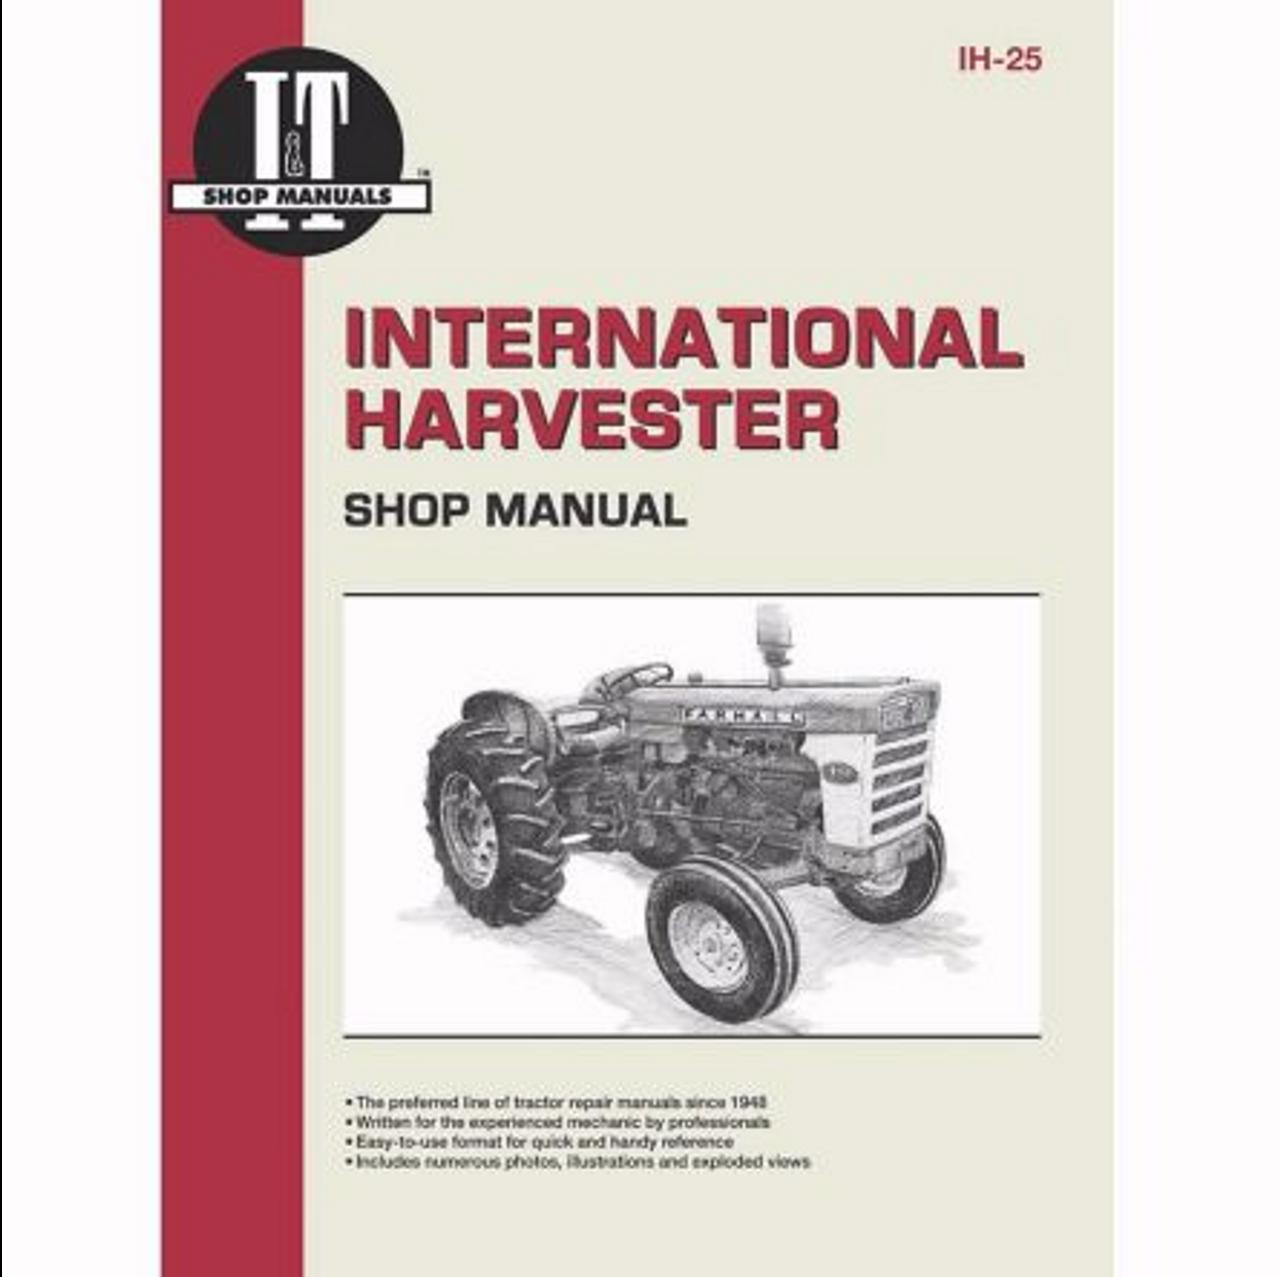 I&T Shop Manuals International Harvesters (Farmall) 460 560 606 660 and  2606 manual. - Farmer Bobs Parts and Supplies LLCFarmer Bobs Parts